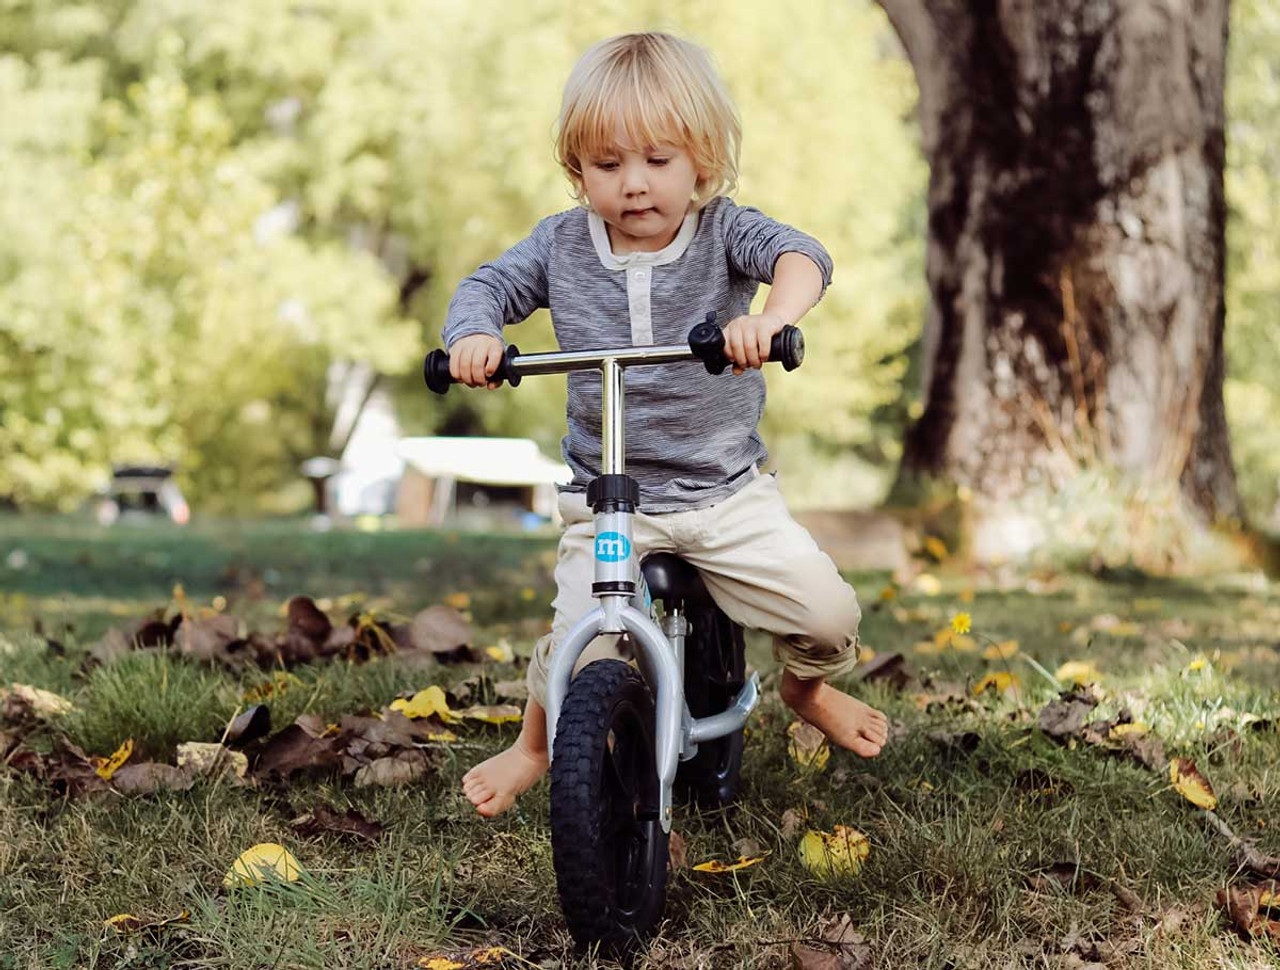 How Do Balance Bikes Work?